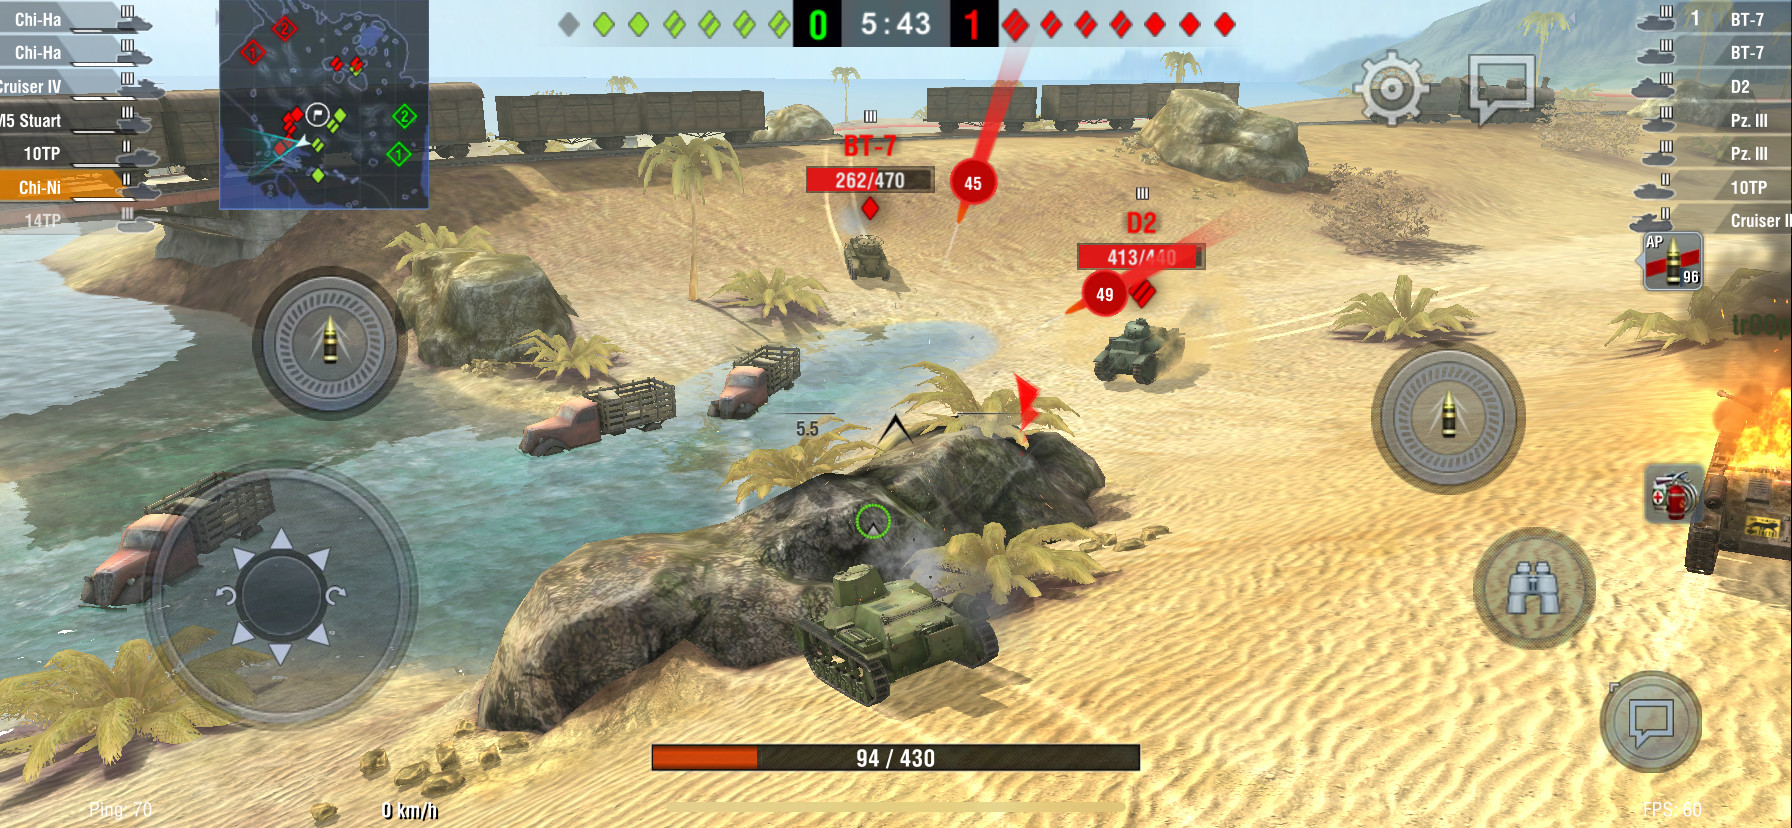 Screenshot 1 - World of Tanks Blitz (App für iPhone & iPad)